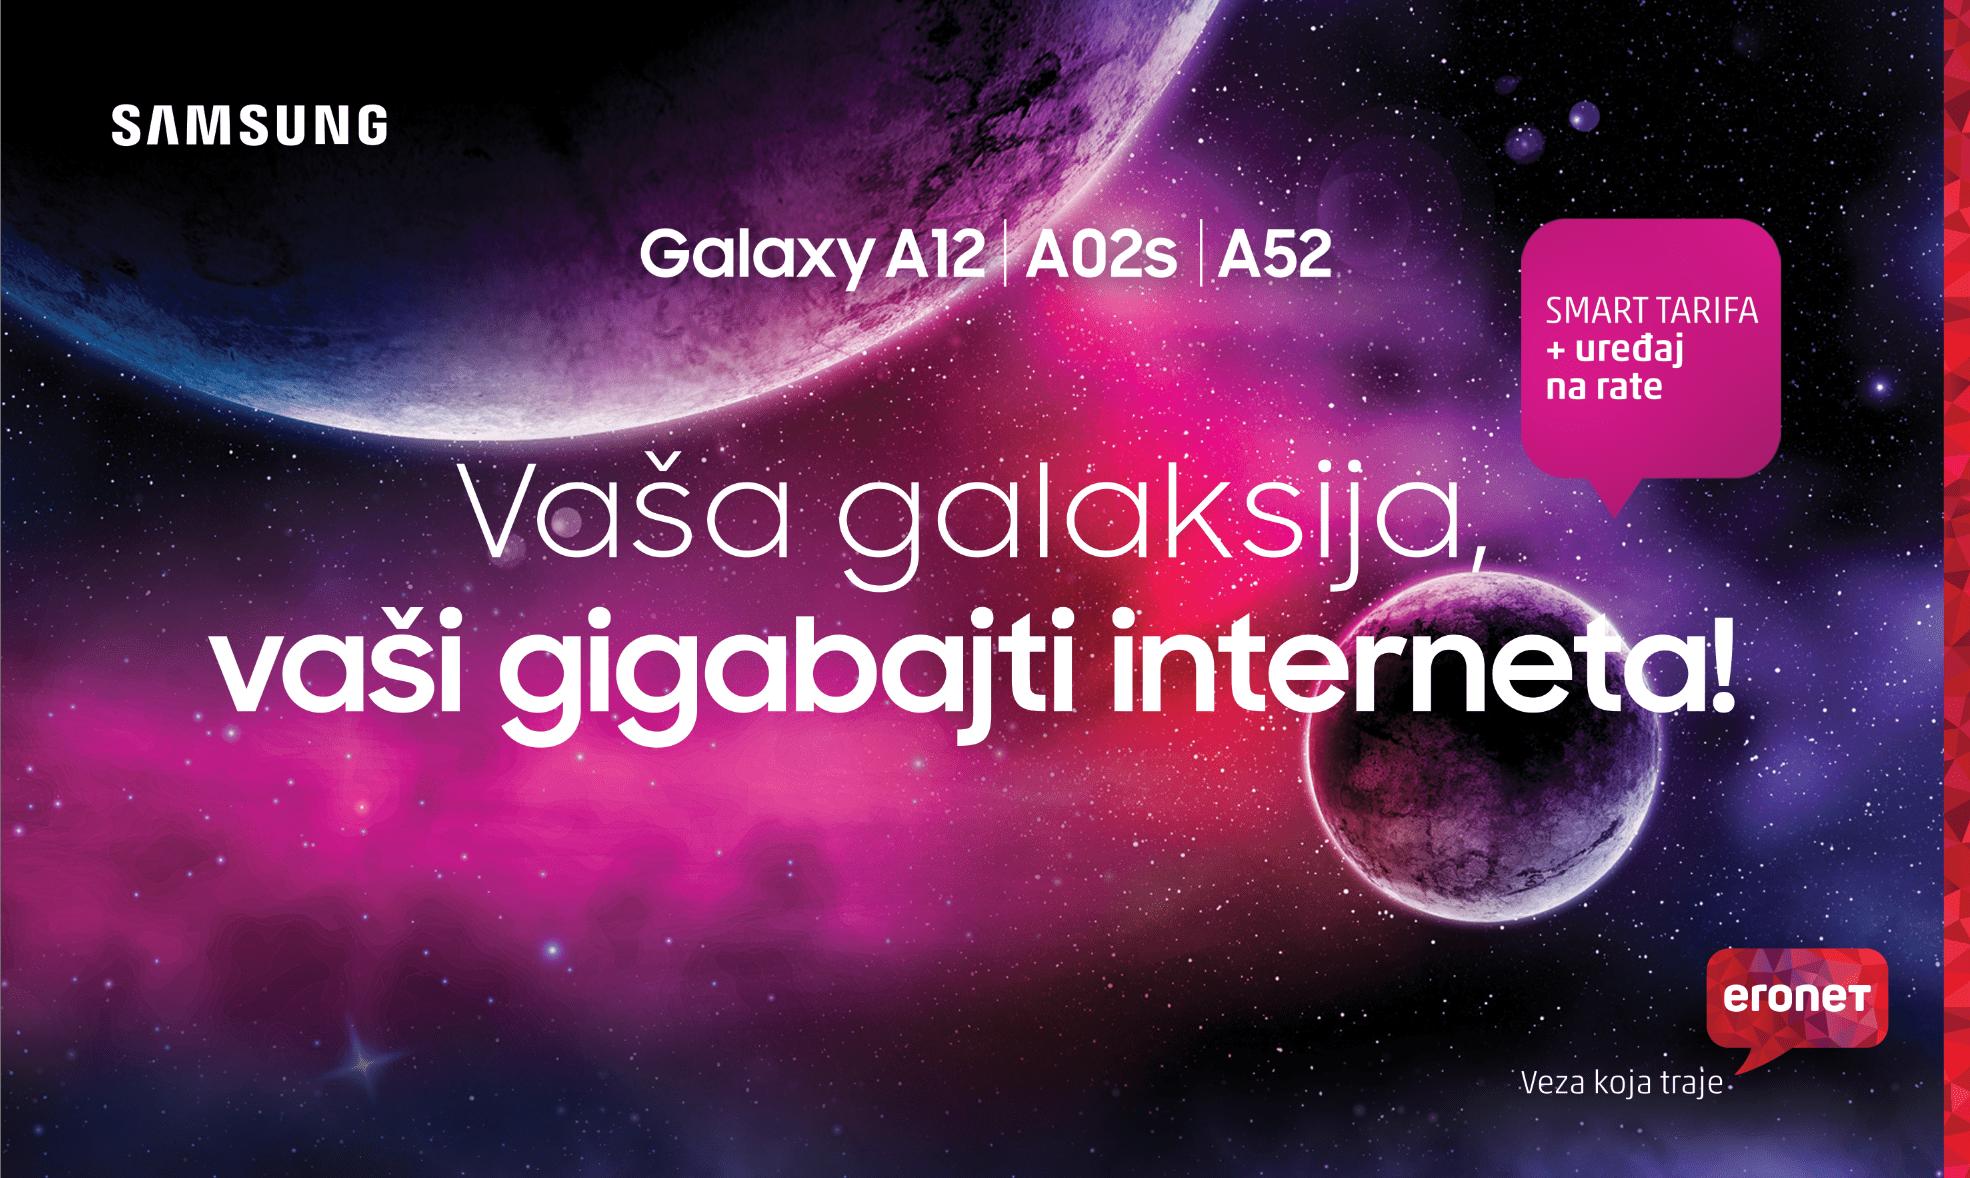 Vasa-galaksija-1